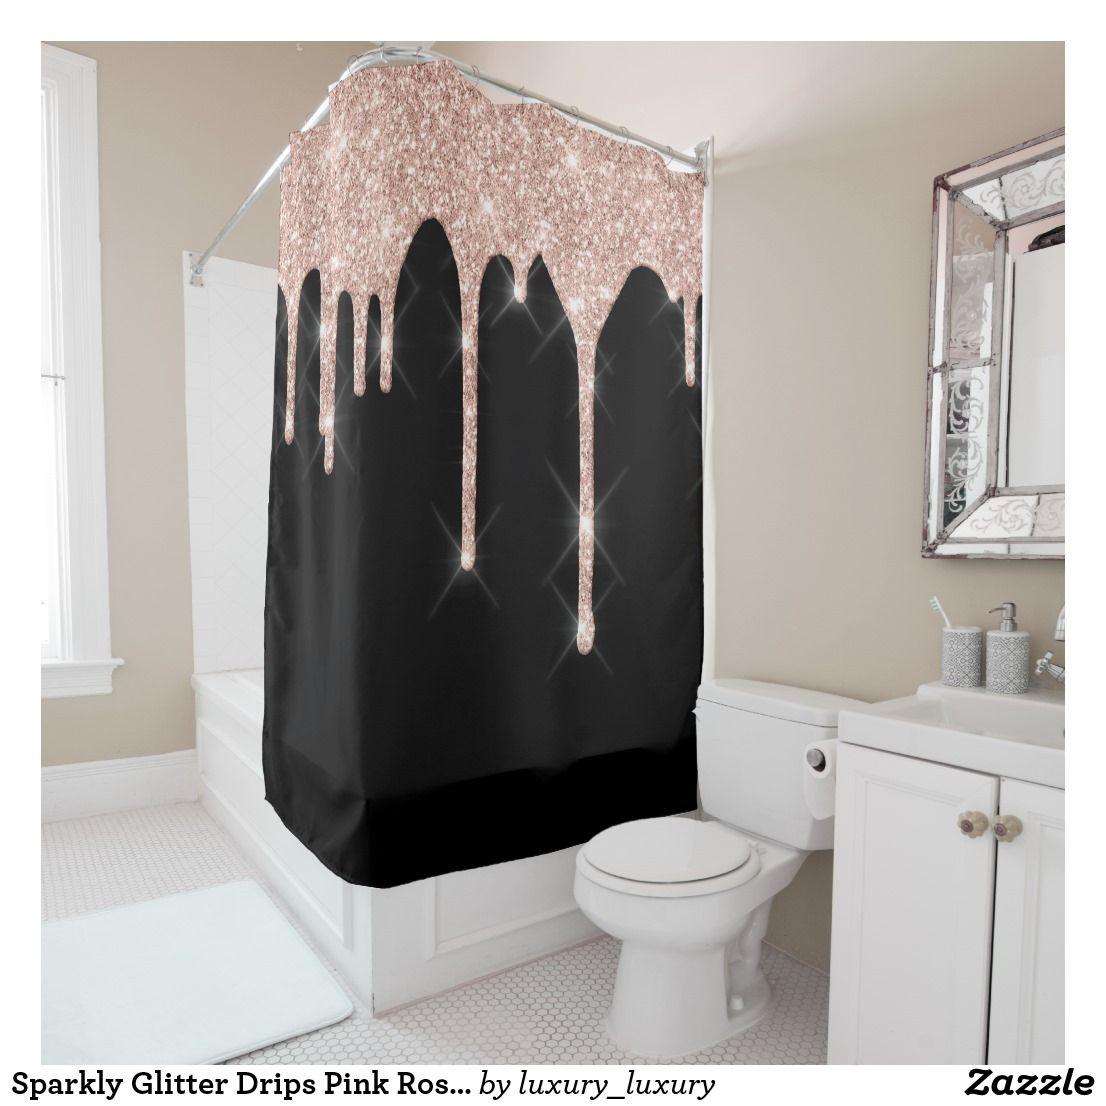 Sparkly Glitter Drips Pink Rose Gold Blush Black Shower Curtain